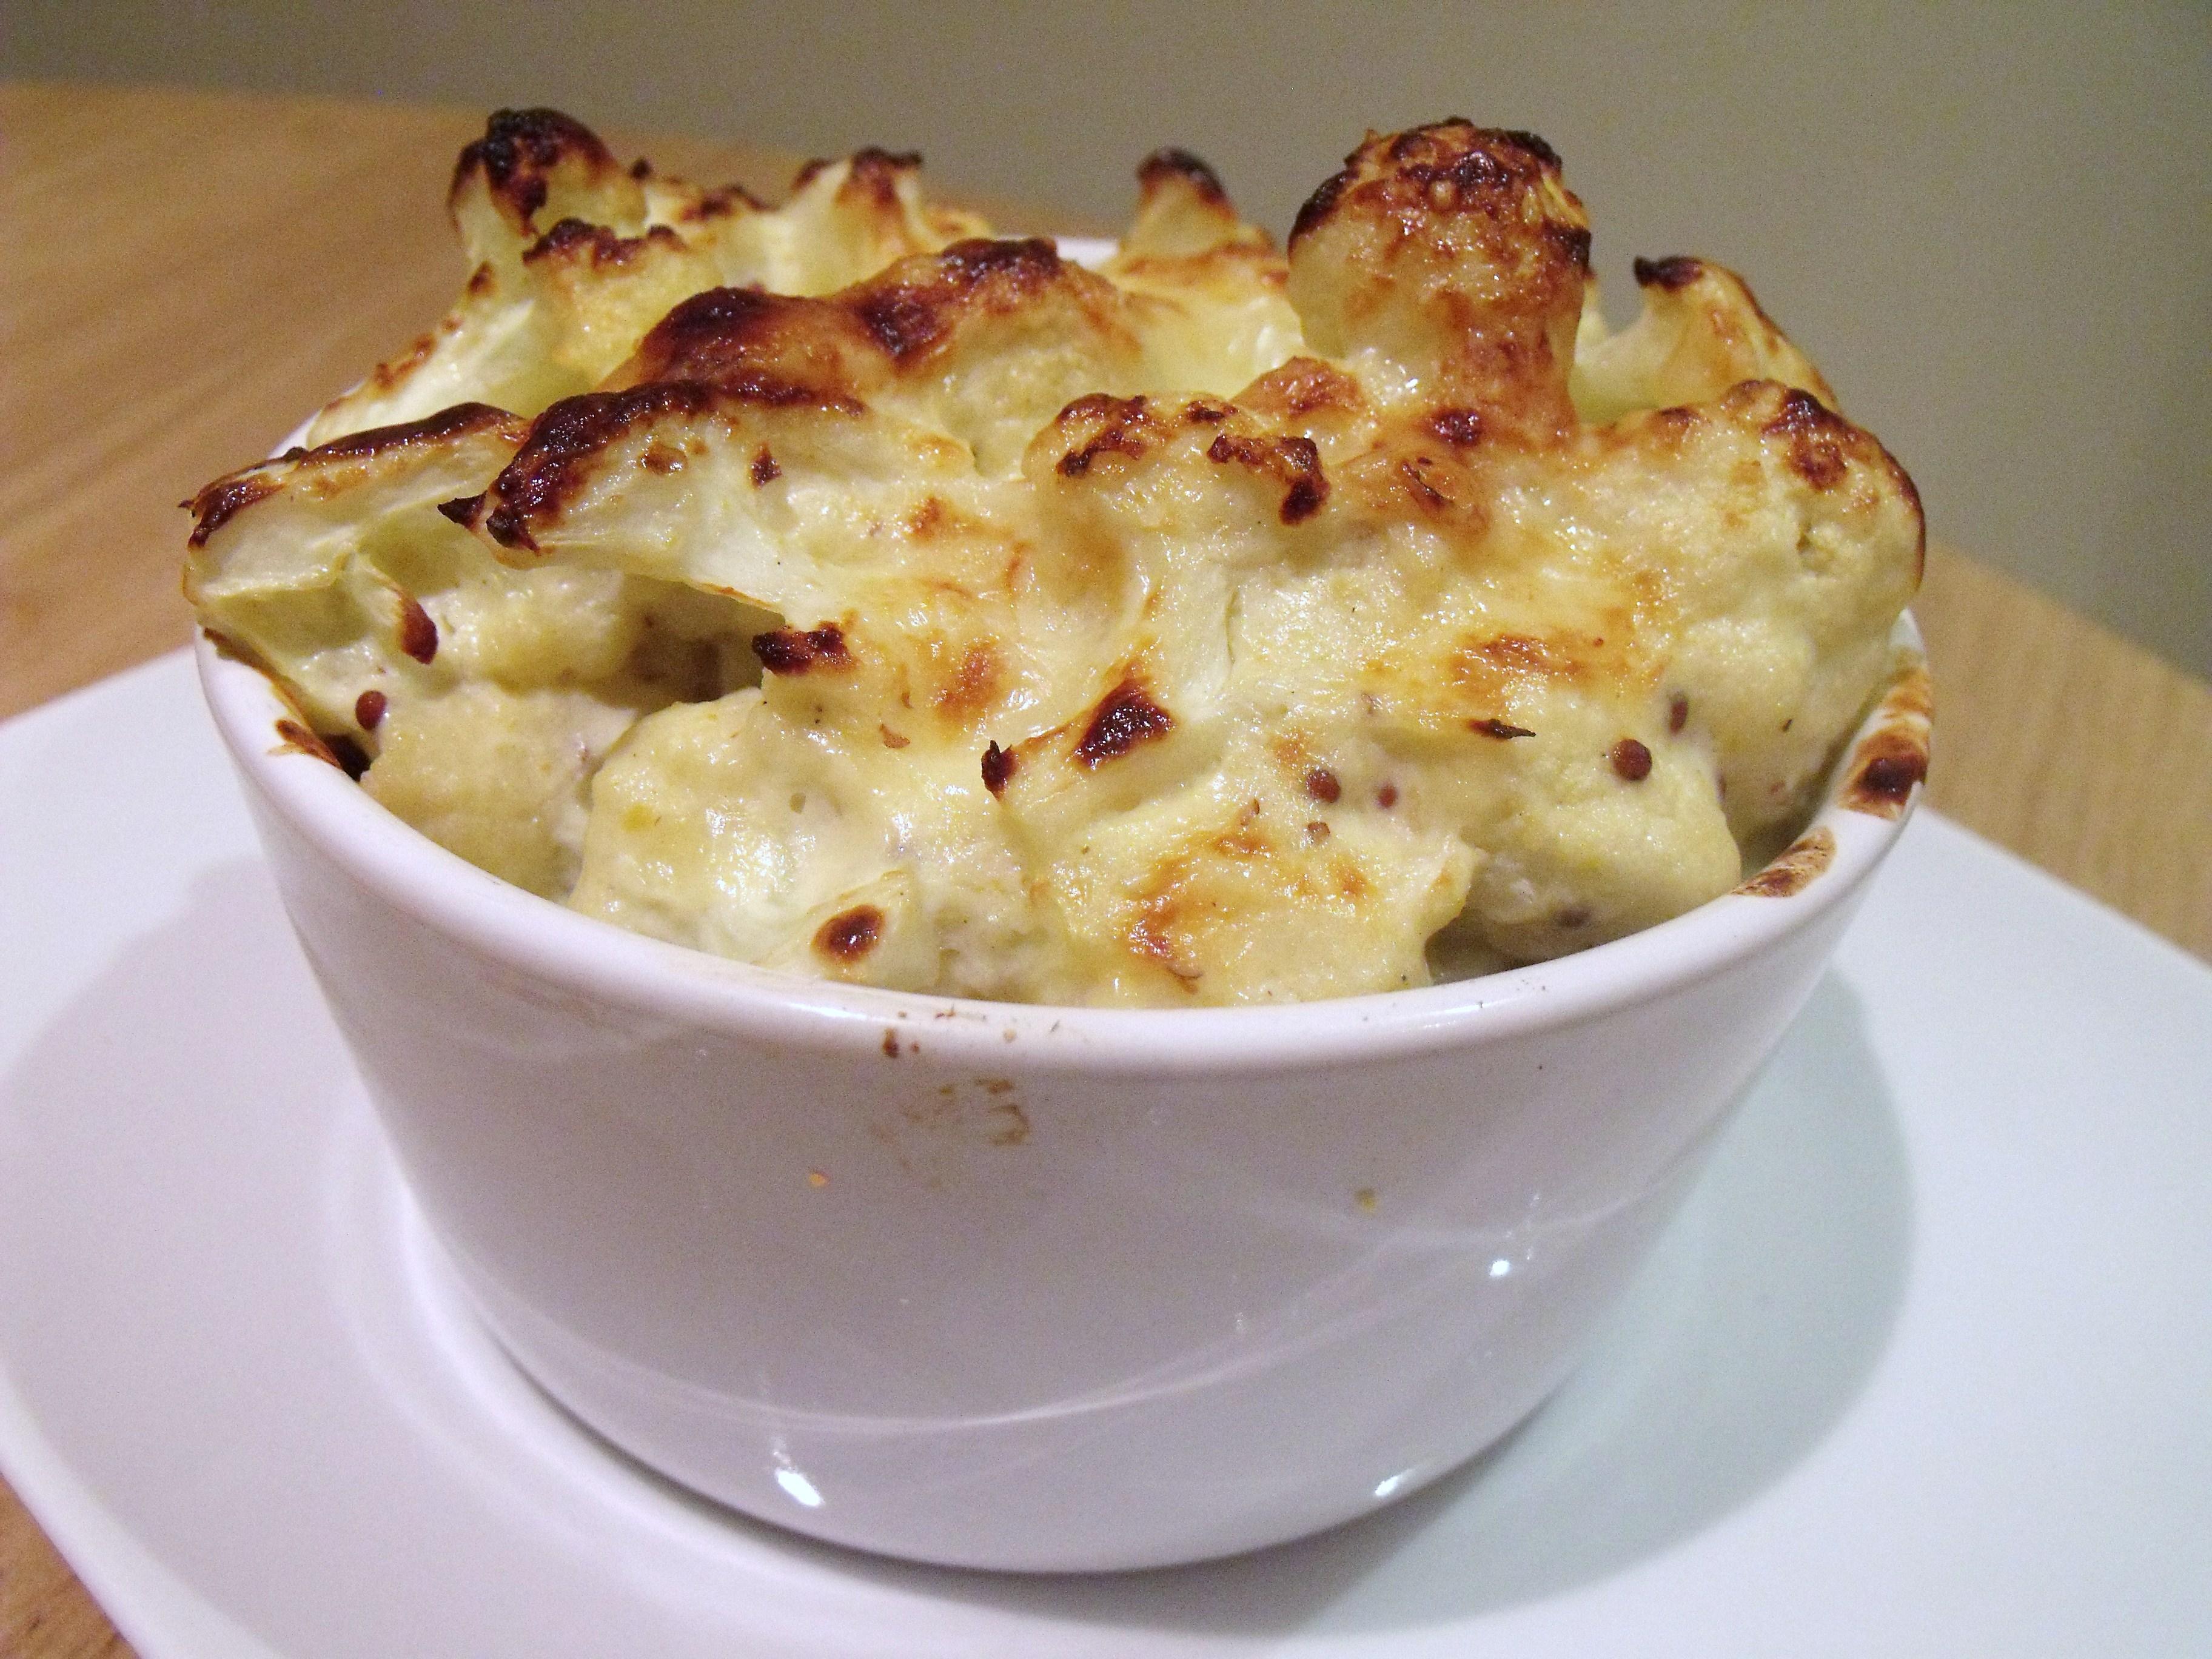 cauliflower cheese pie cauliflower cheese pie cauliflower cheese pie ...